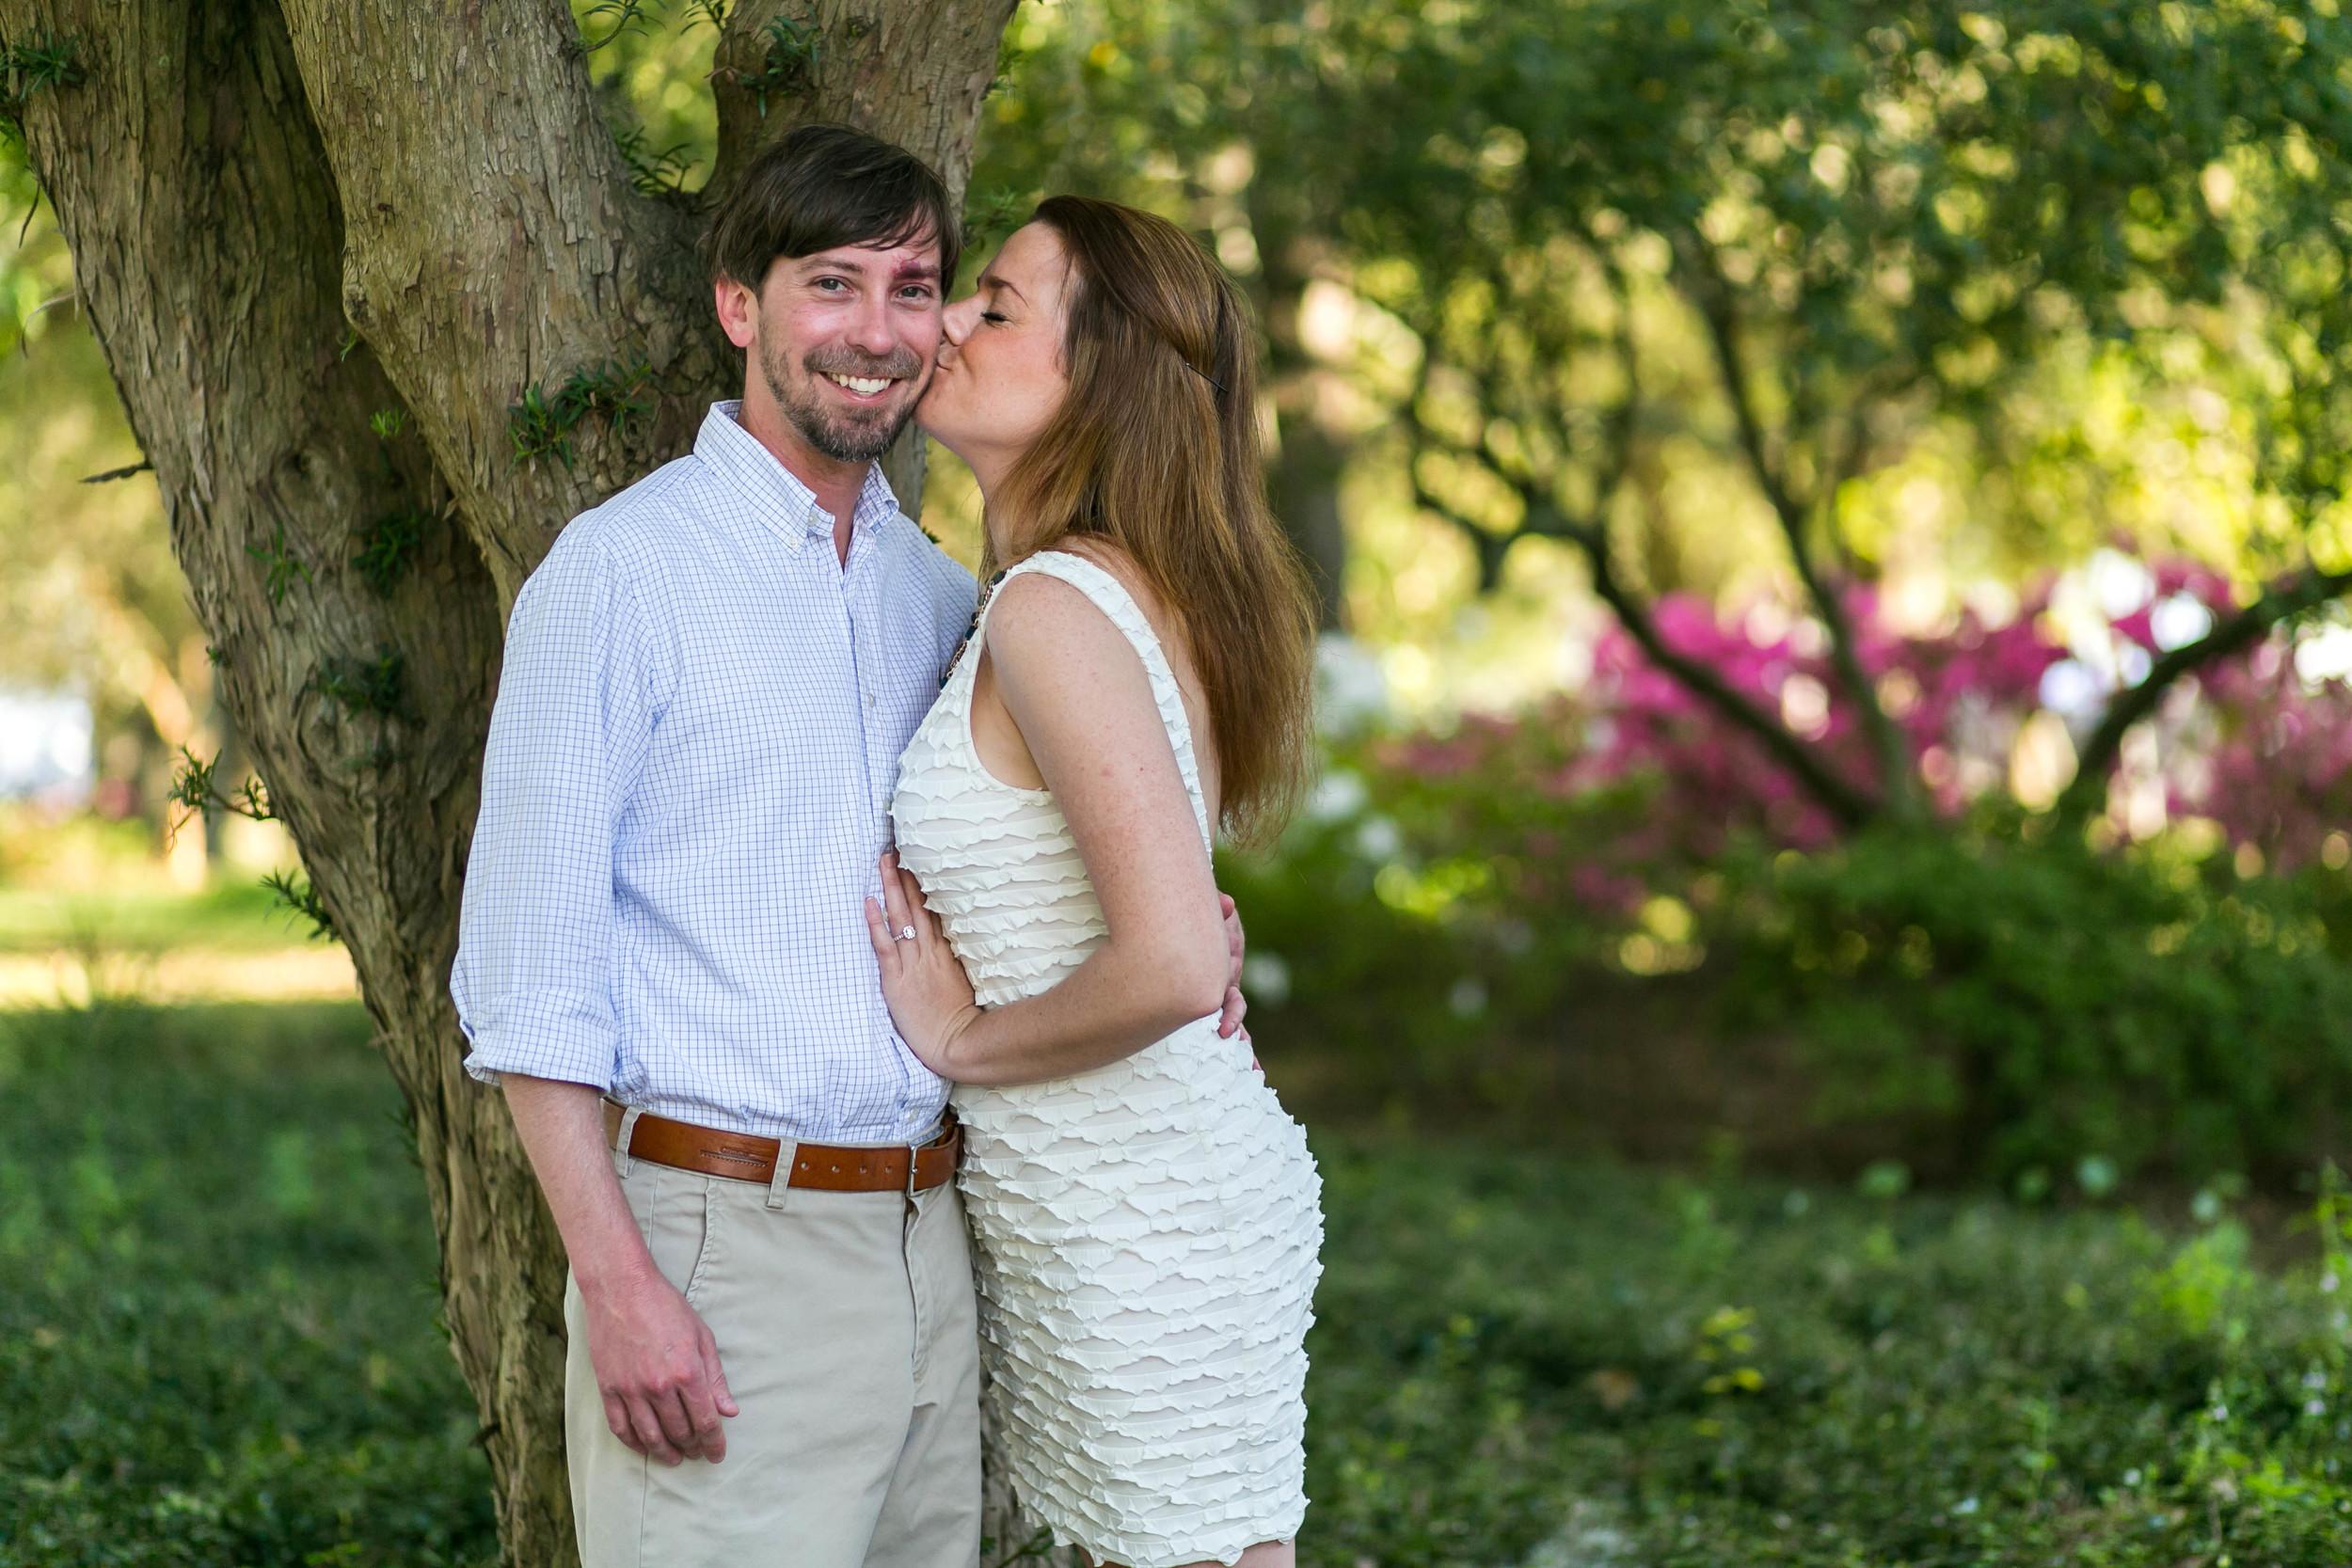 adam-szarmack-riverside-jacksonville-engagement-photographer-586A7633.jpg